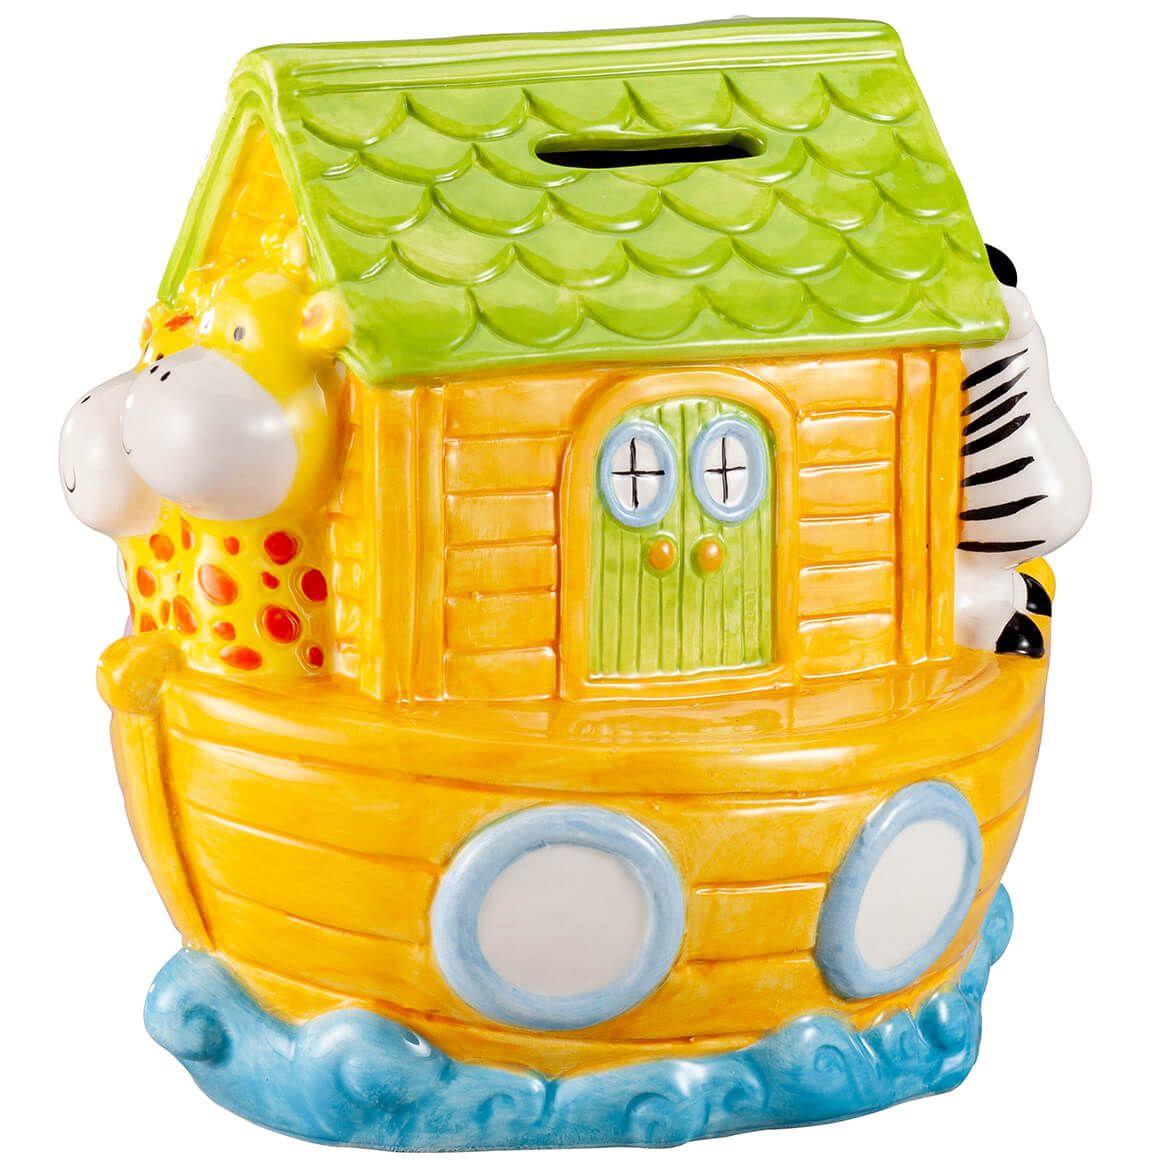 Personalized Noah's Ark Bank-367968